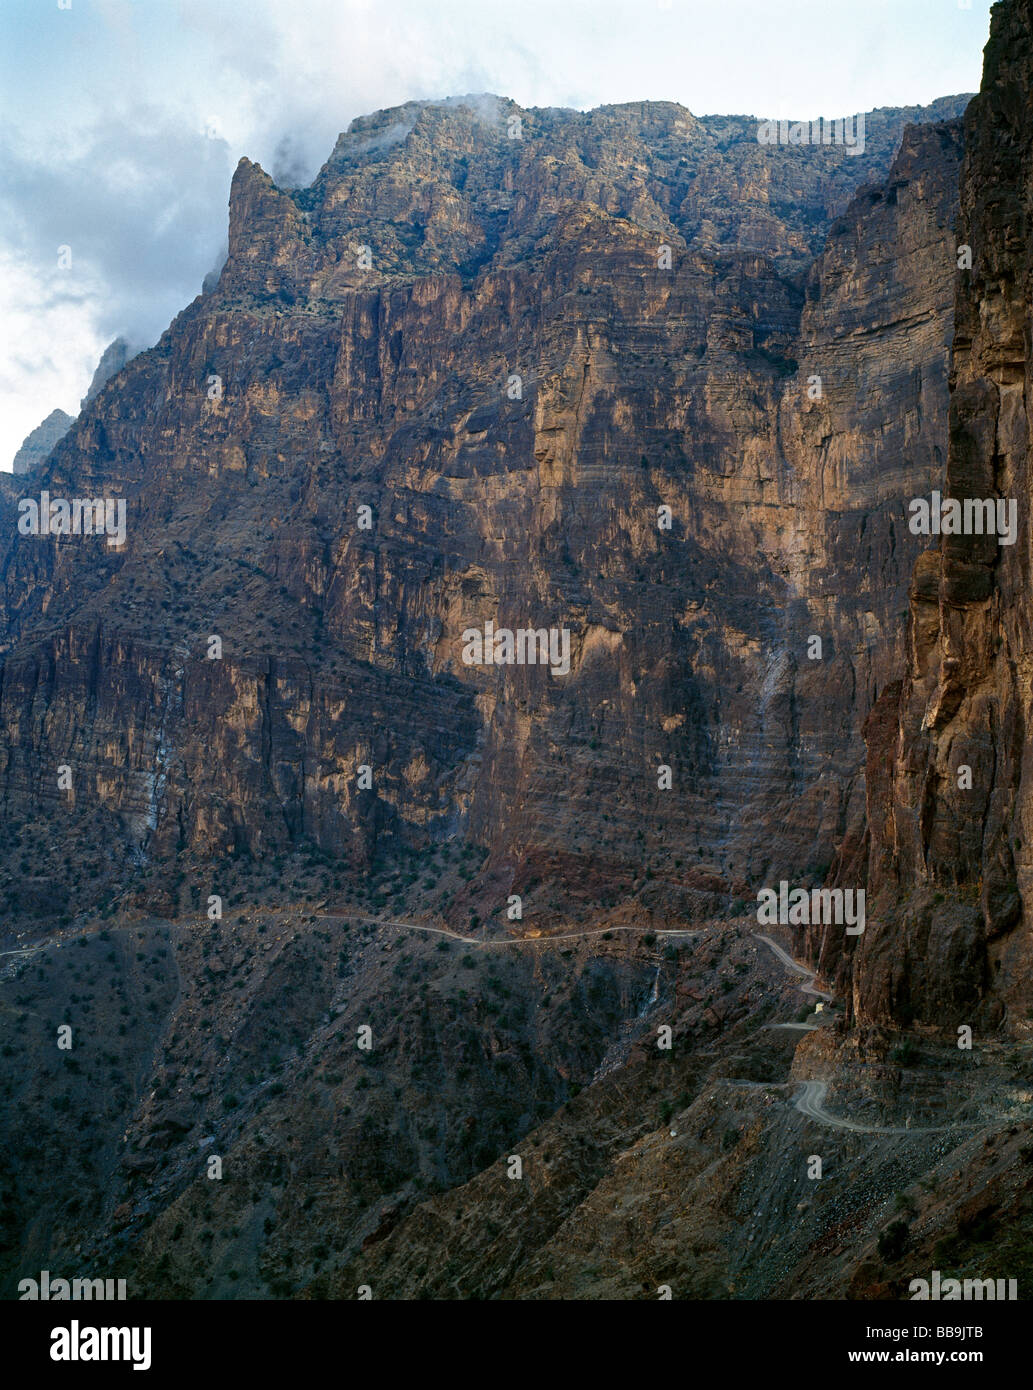 Splendida strada di ghiaia a Yasab Yasib Al Hajar al Gharb mountainsi sulla sommità di Jabal Shams Immagini Stock